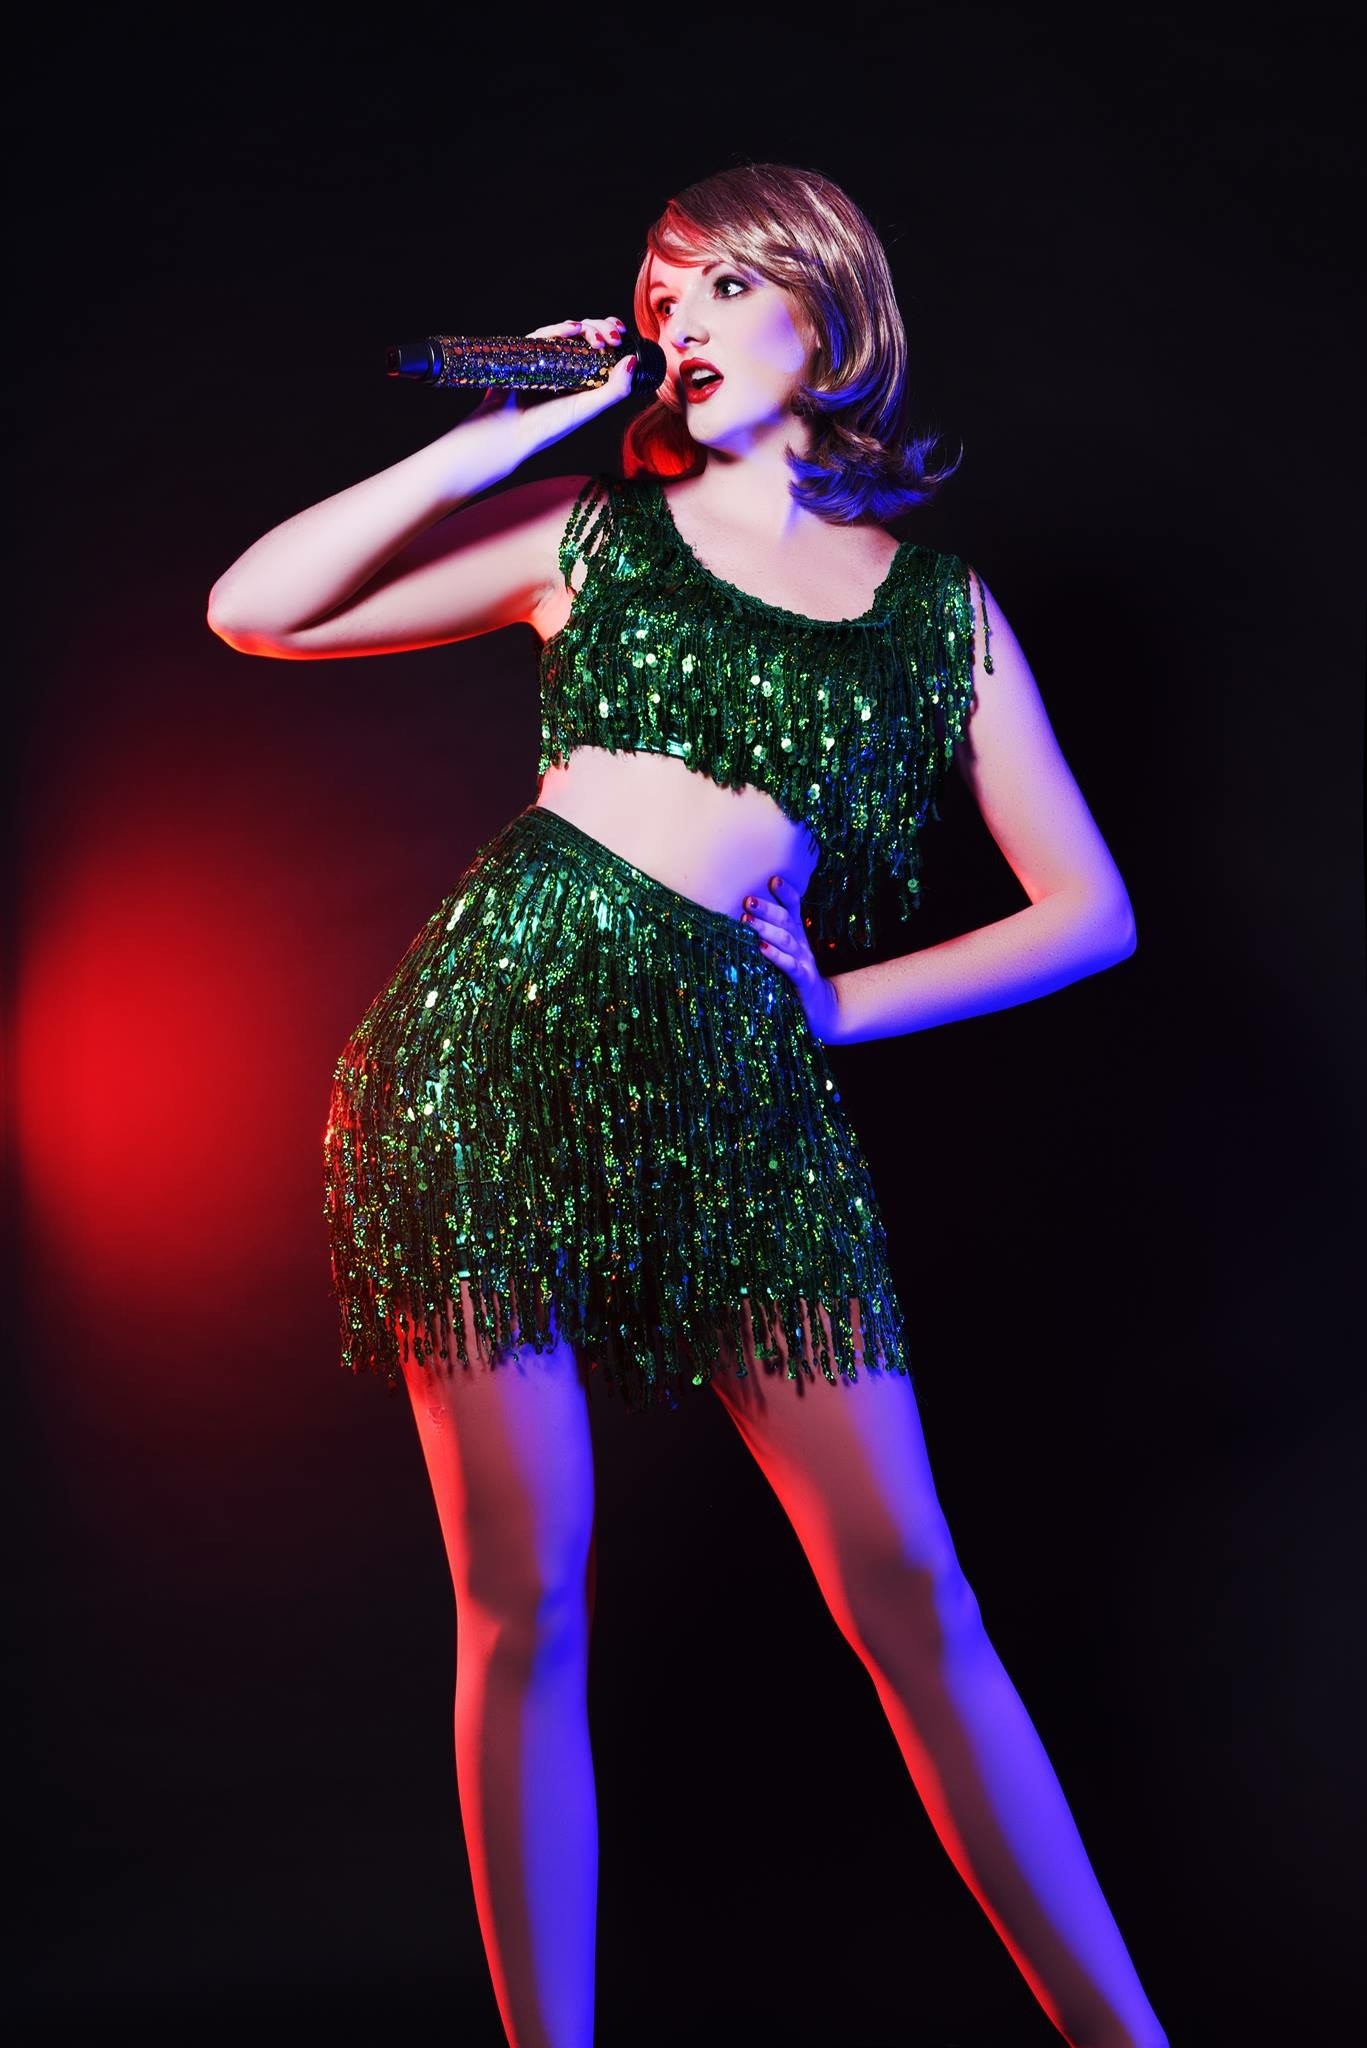 Taylor Swift2 xsp.co.uk.jpg